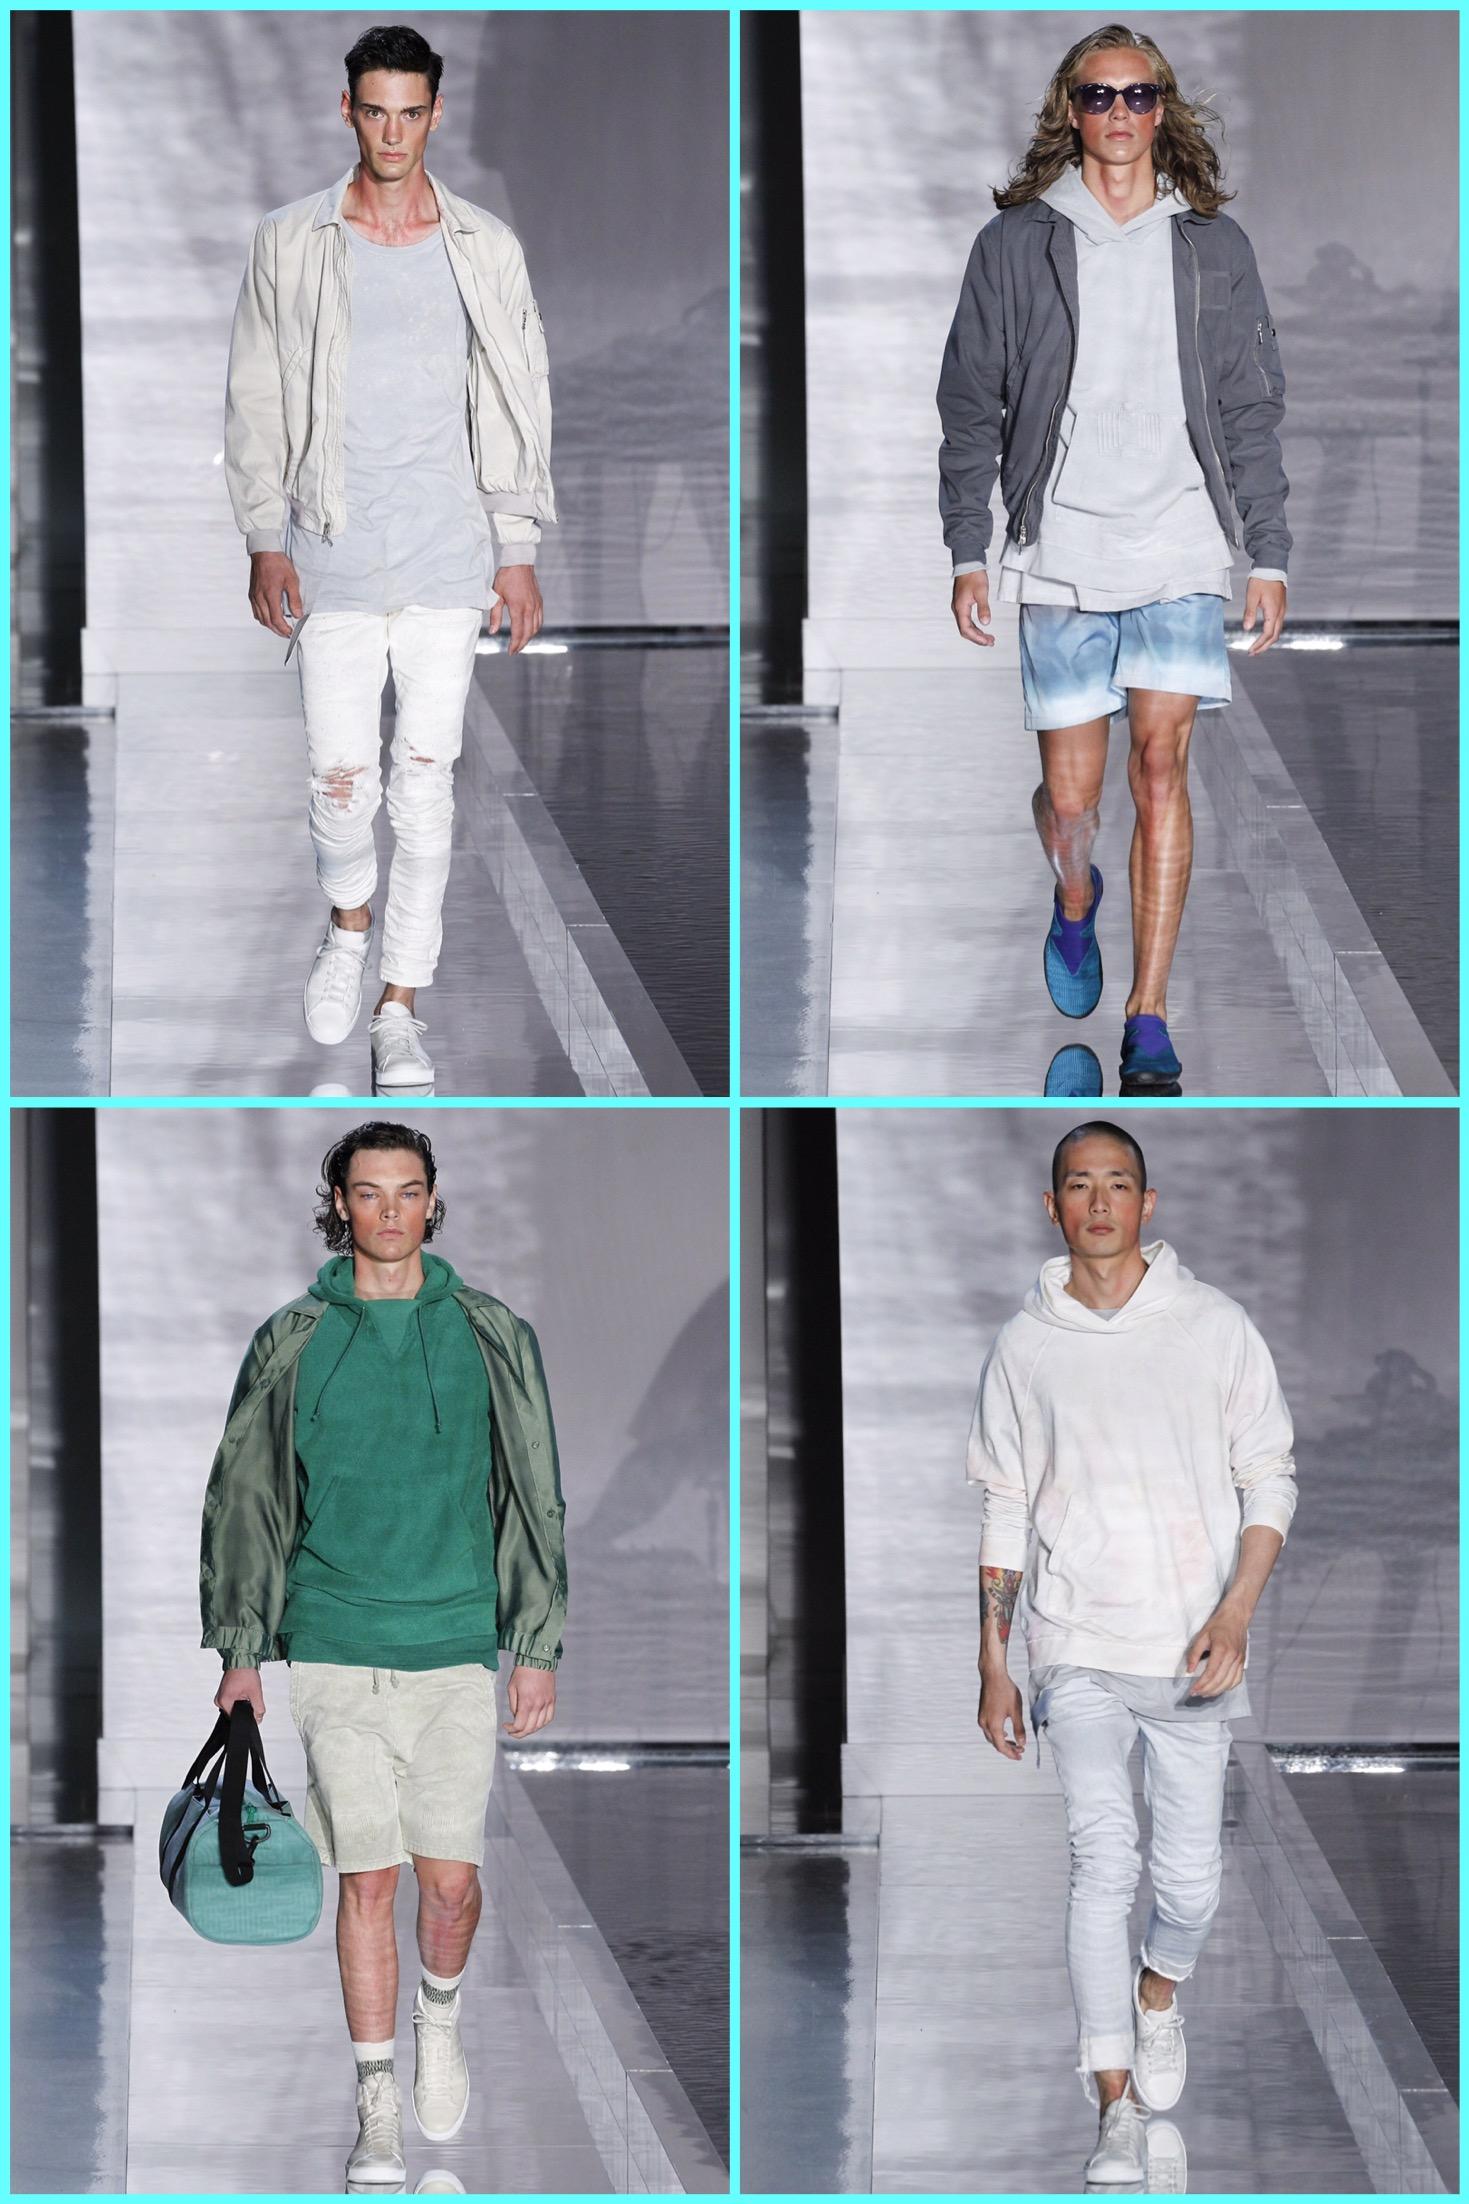 ny-fashion-week-menswear-spring-summer-2017-style-john-elliott